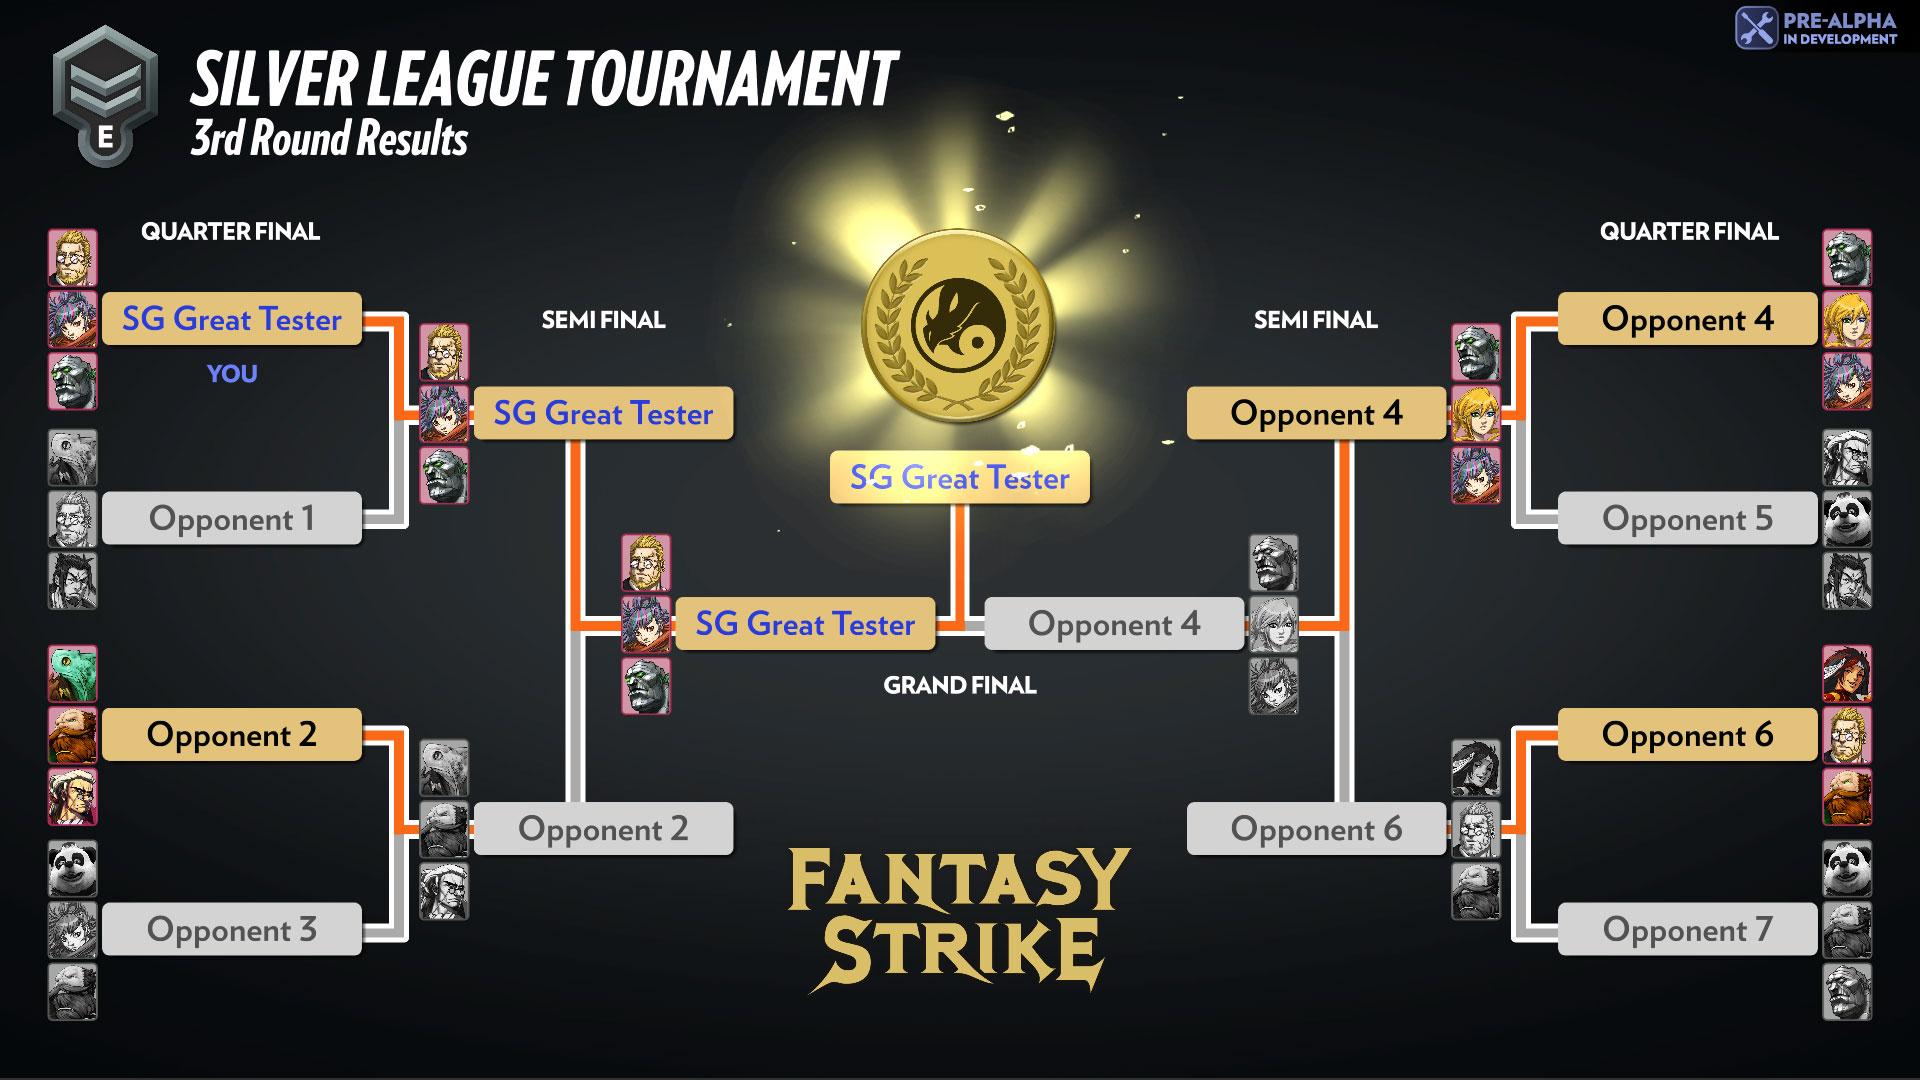 tournament_bracket2.jpg